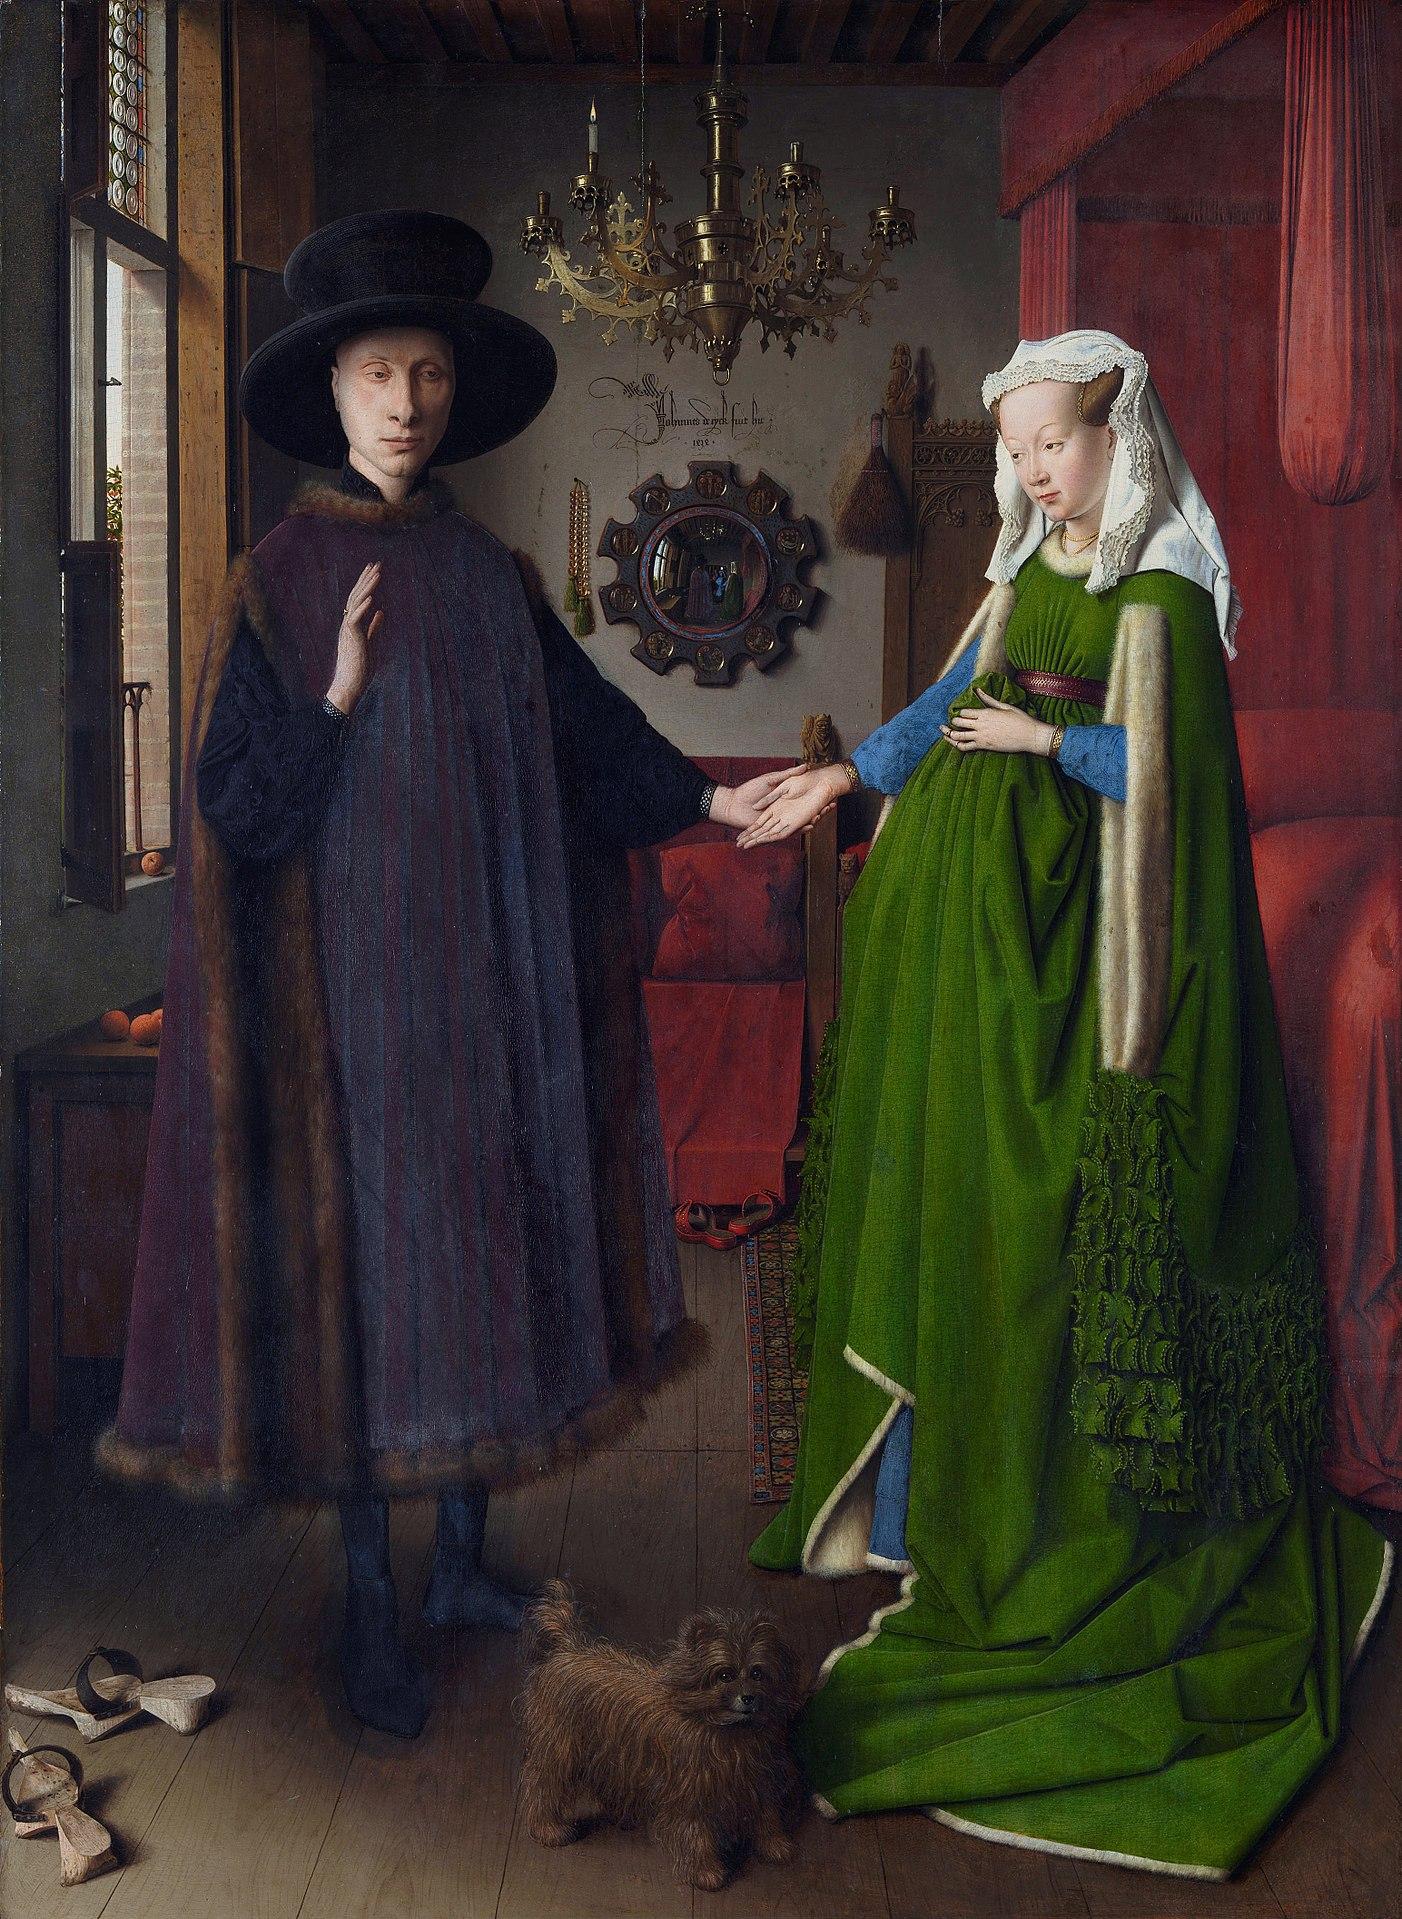 1402px-Van_Eyck_-_Arnolfini_Portrait.jpg